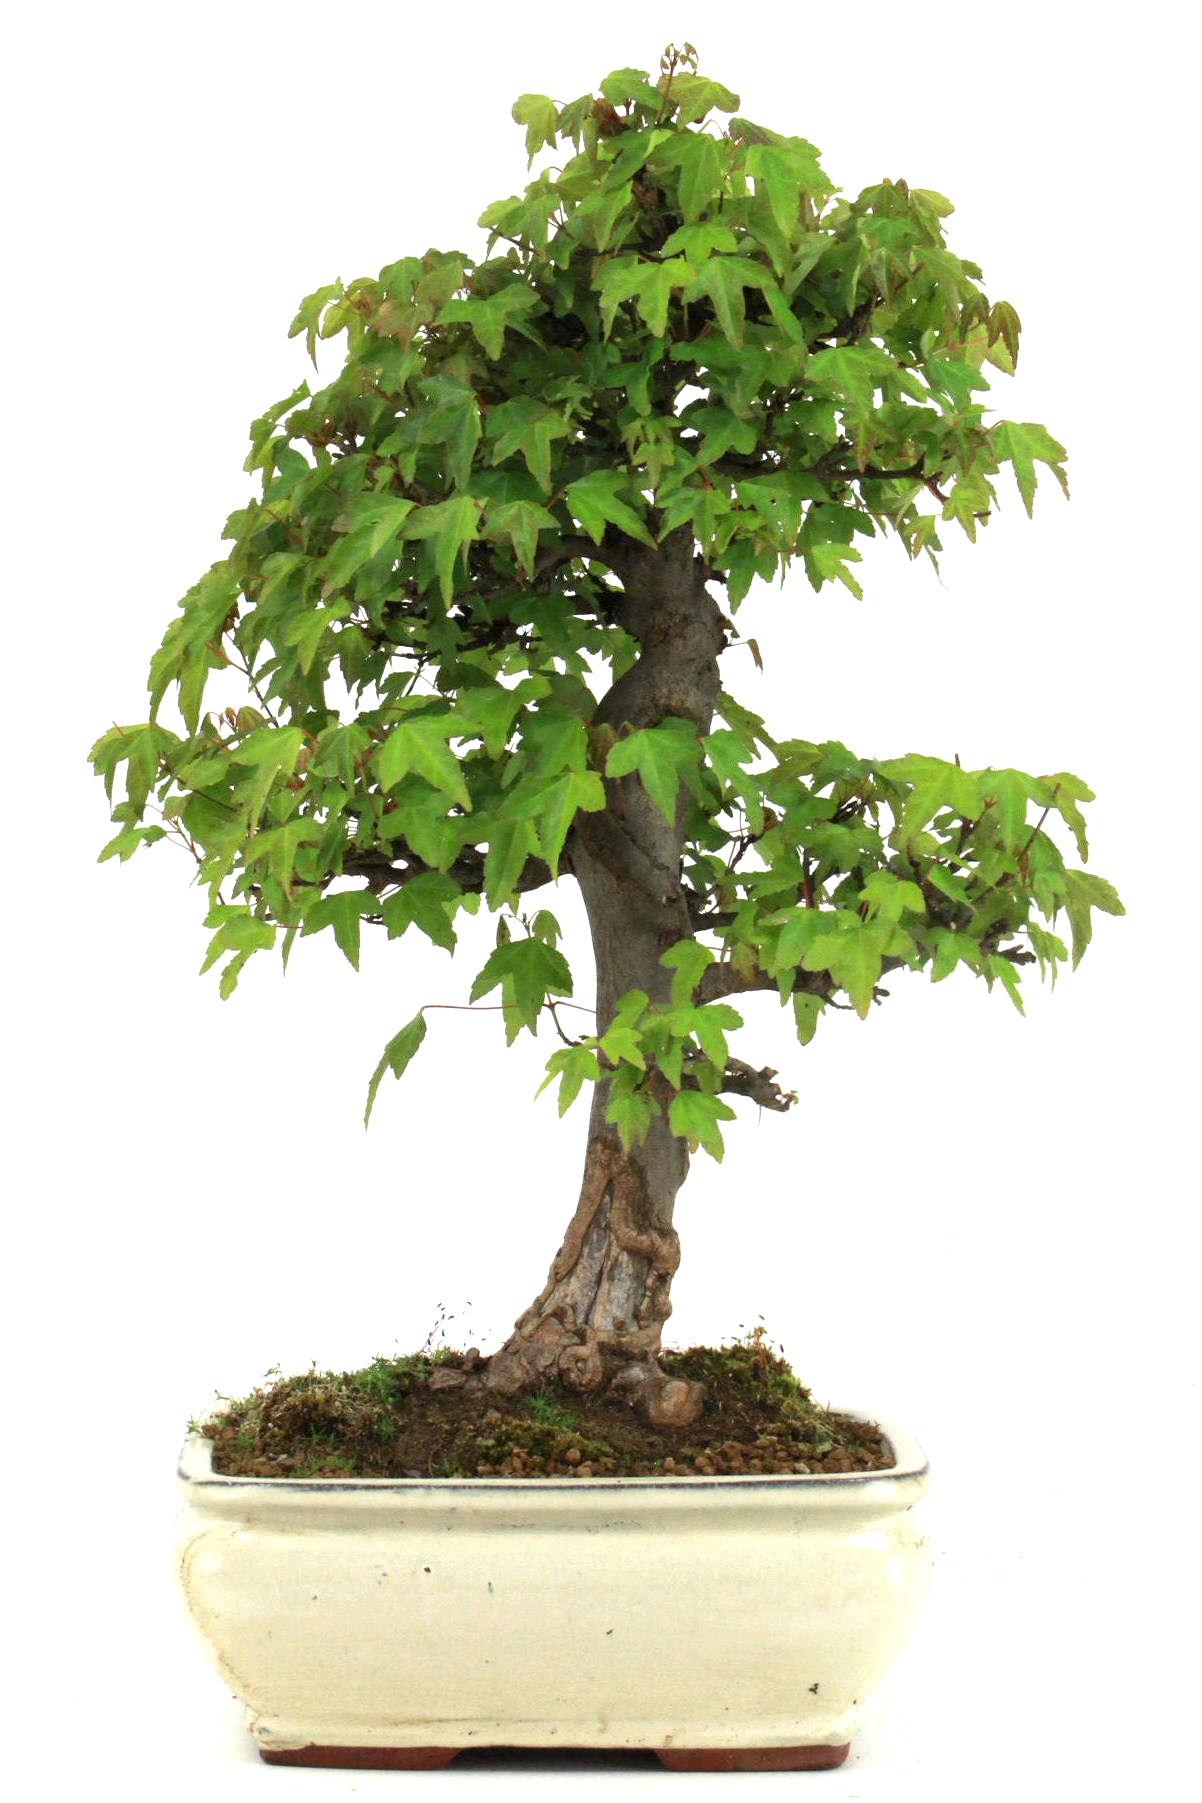 Bonsai dreispitz ahorn 54 cm 2624 bei oyaki bonsai kaufen for Bonsai versand